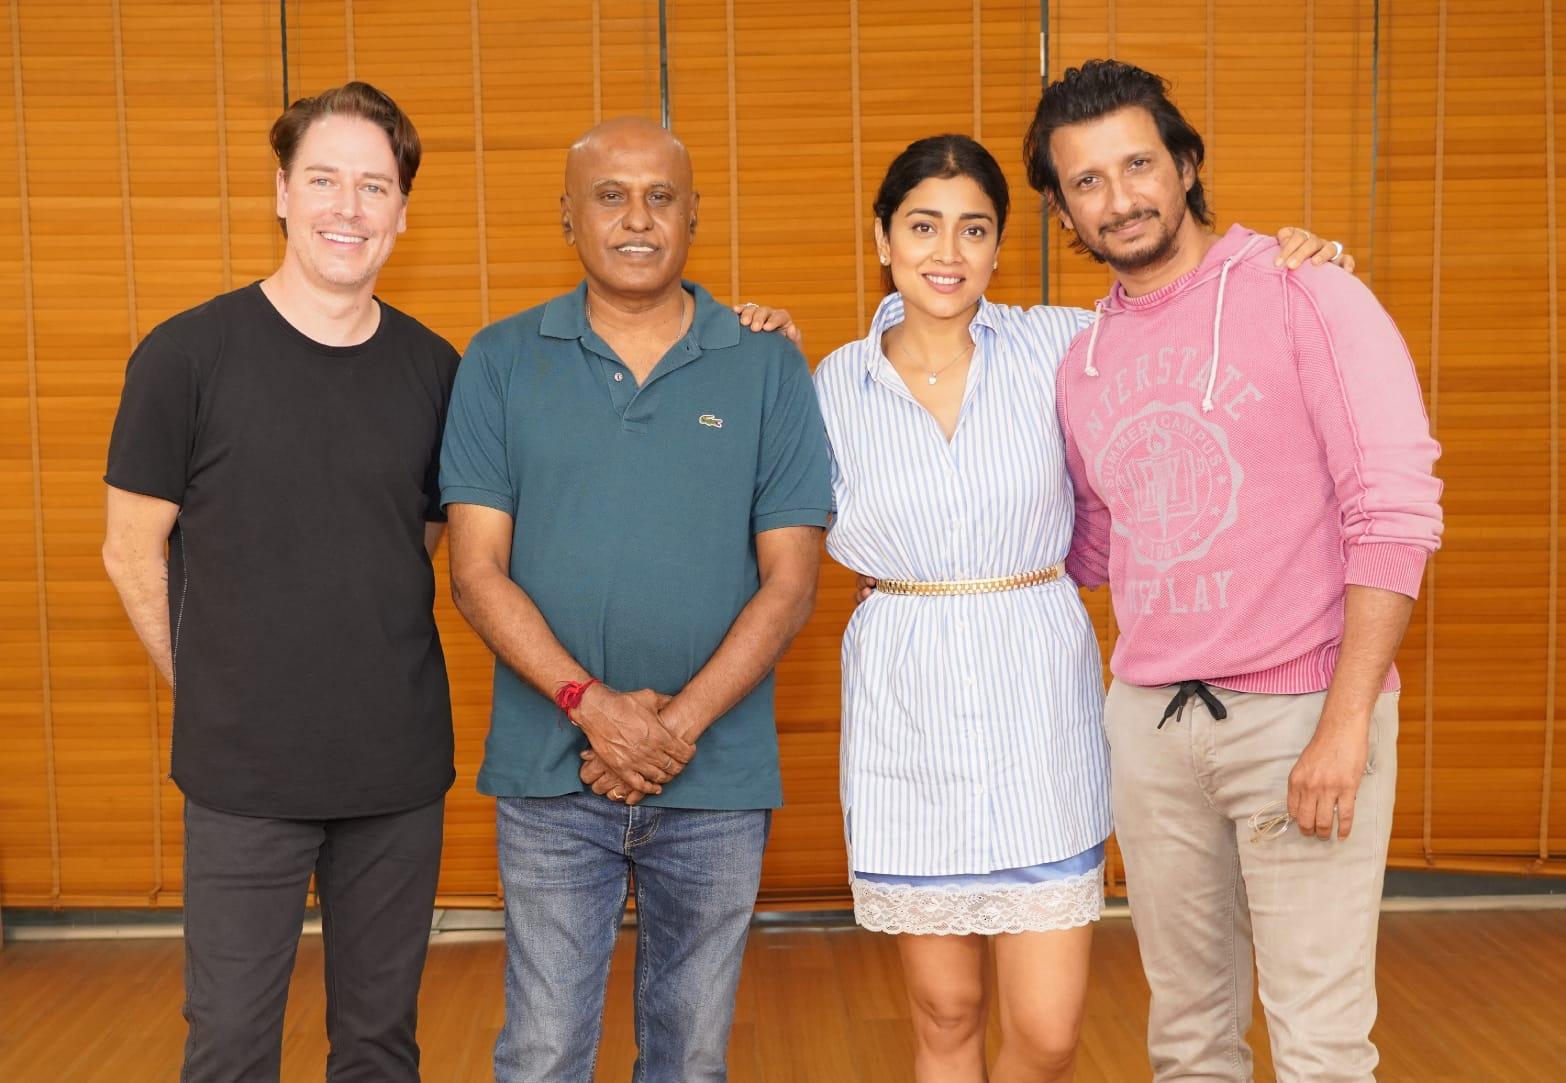 Yamini Films announces Music School by Ilaiyaraaja starring Sharman Joshi Shriya Saran